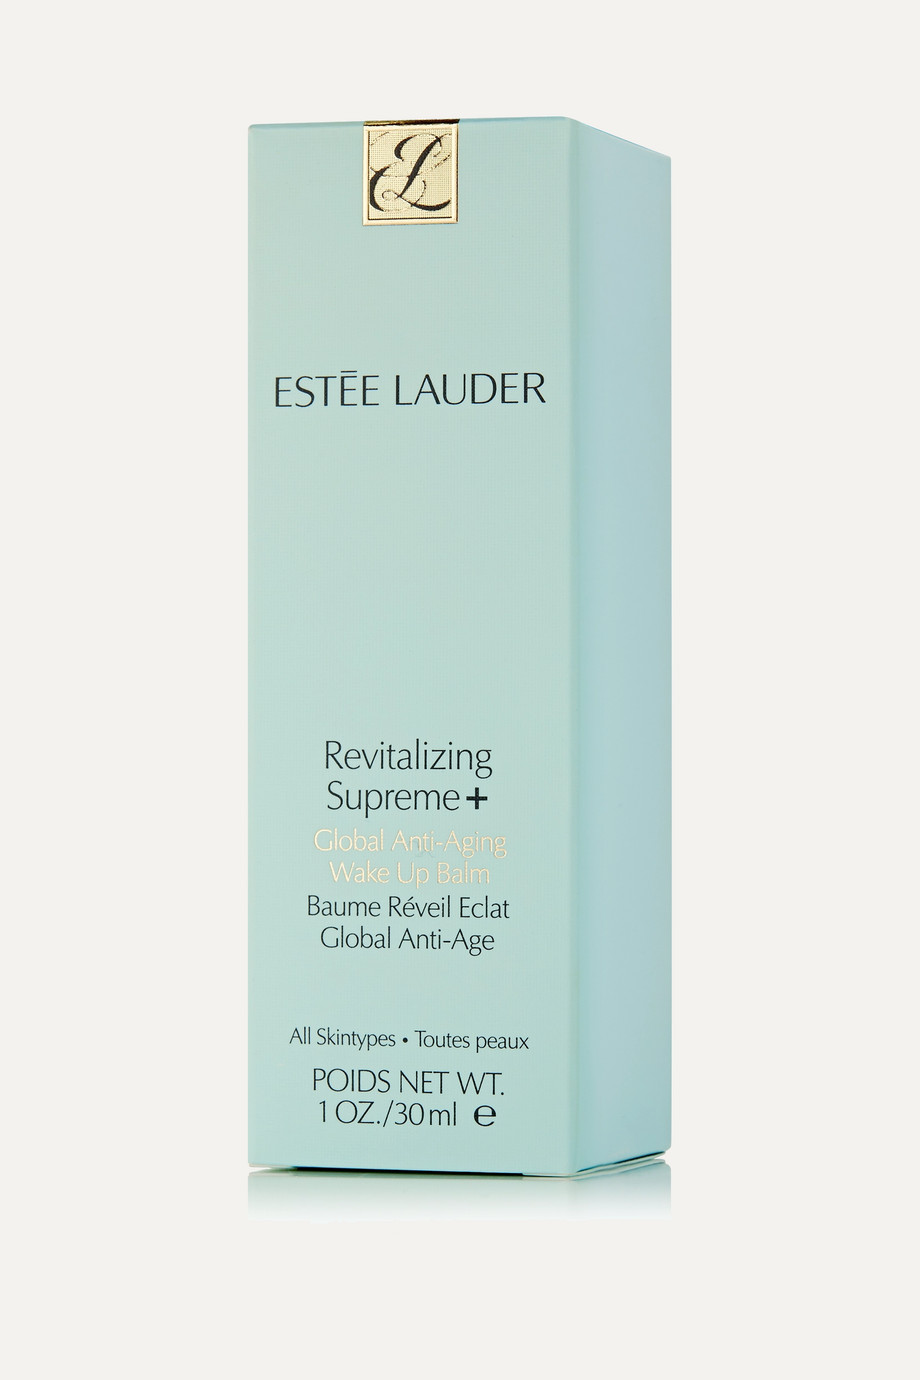 Estée Lauder Revitalizing Supreme + Global Anti-Aging Wake Up Balm, 30ml